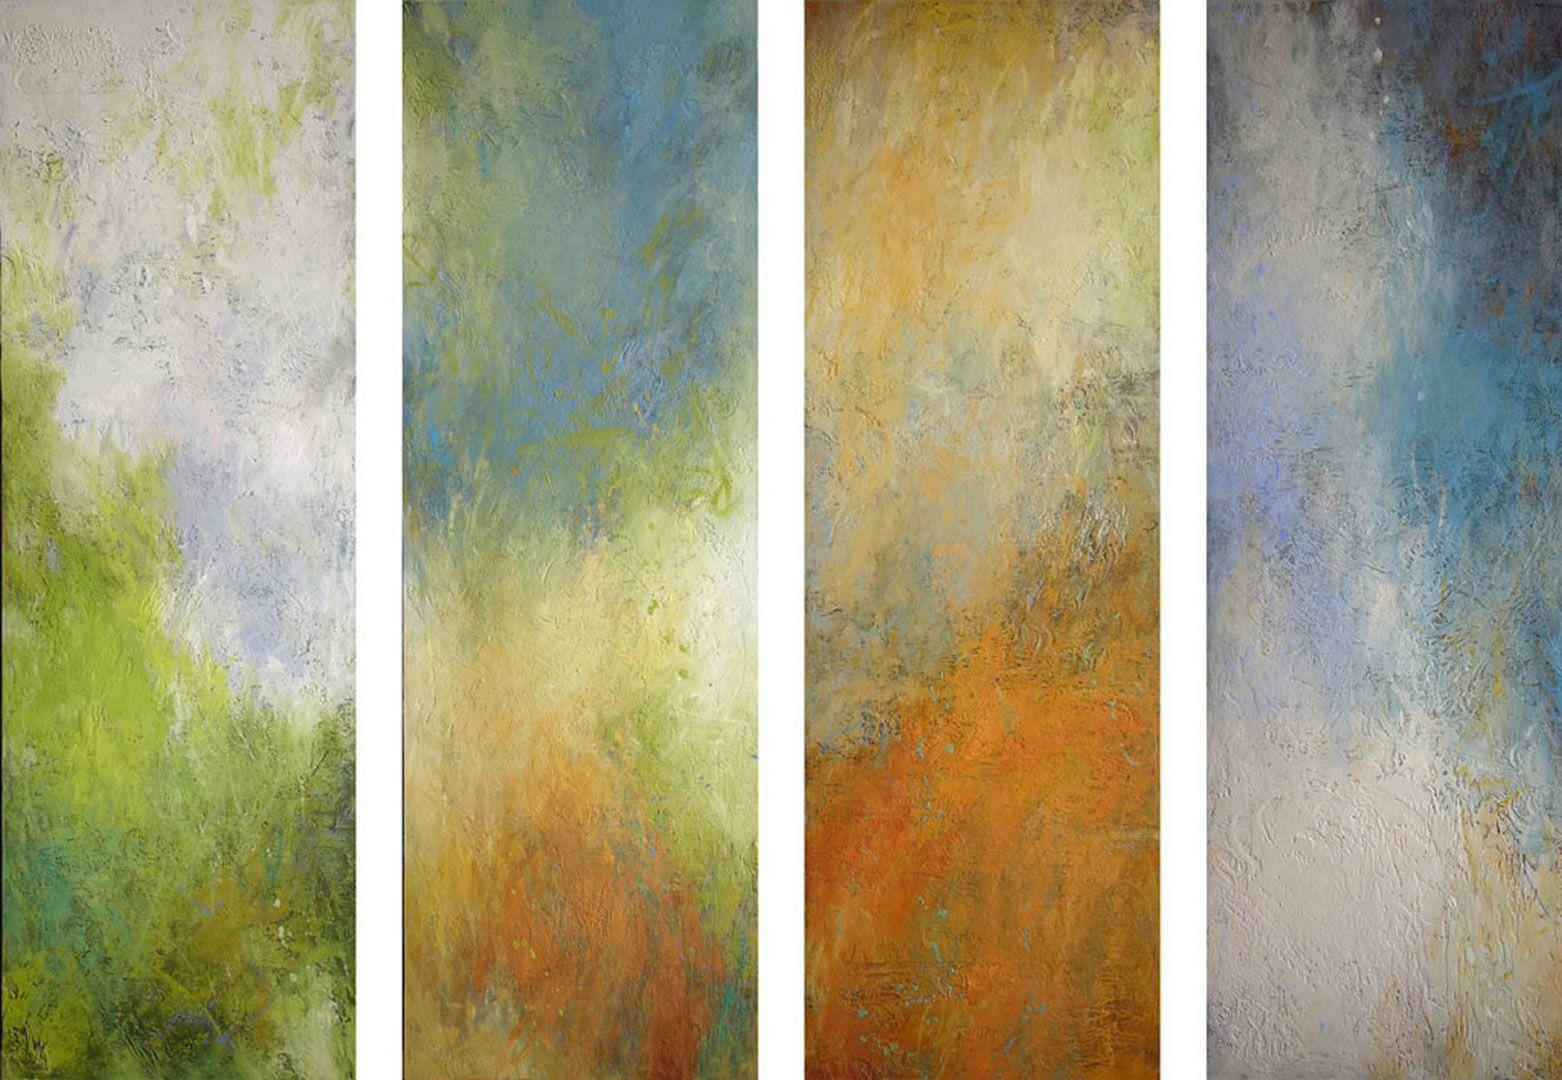 Spring Summer Autumn Winter (4 panels)